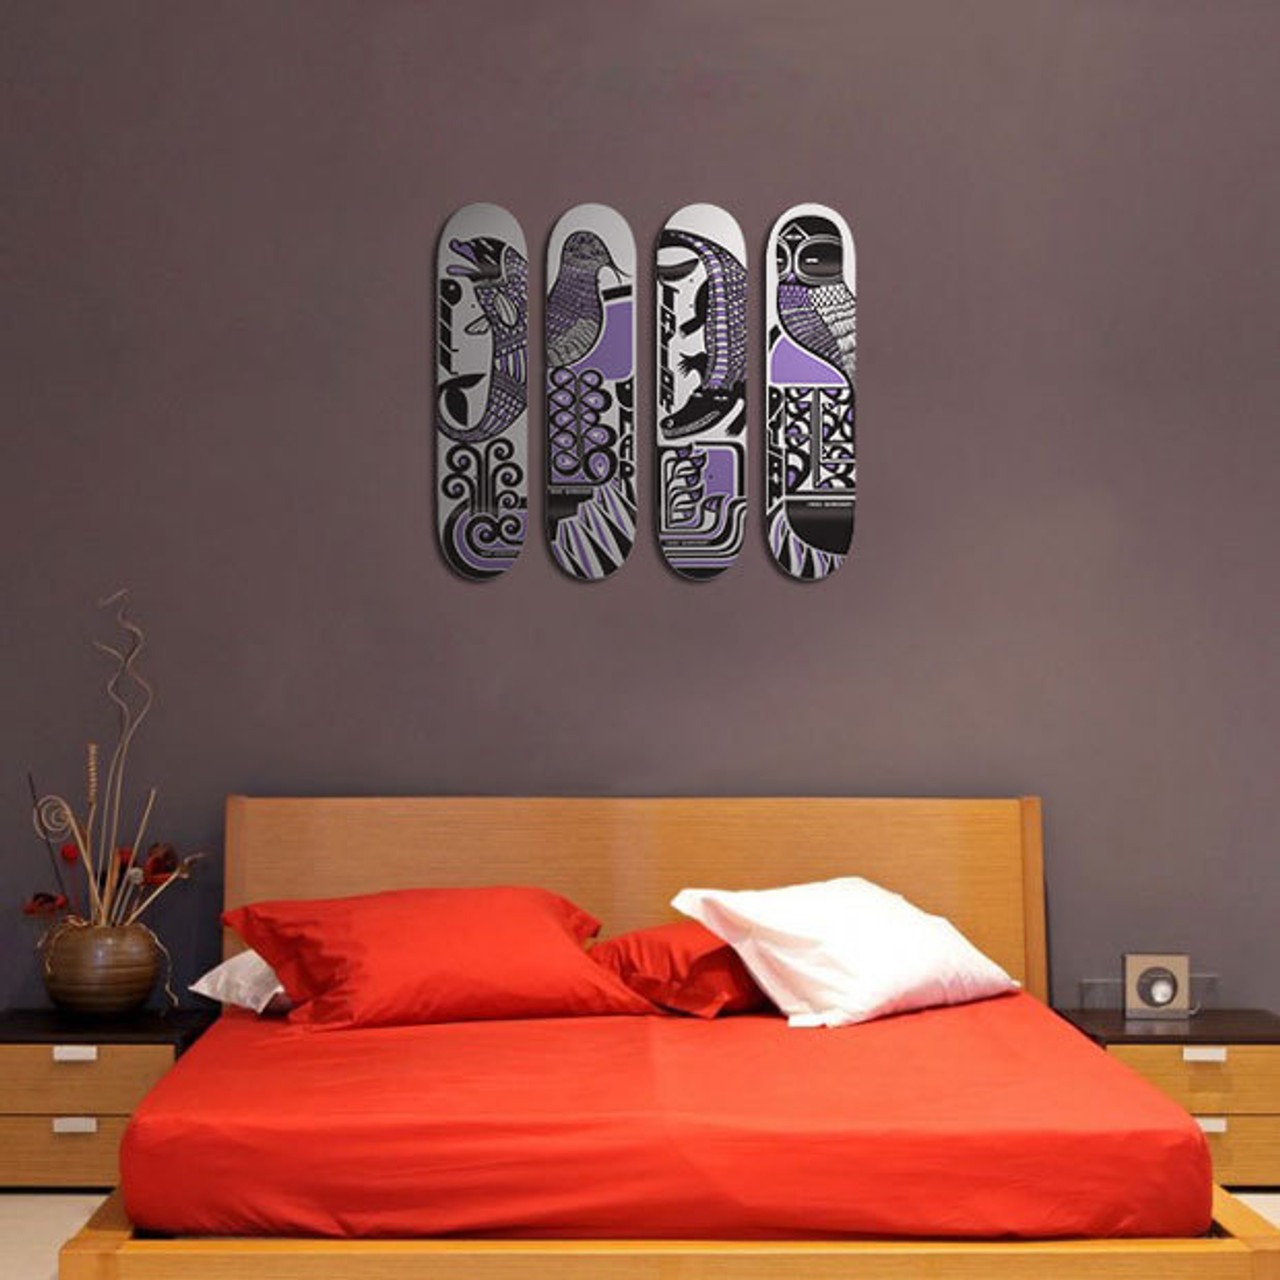 Skateboard Art | Deck Display Mount - StoreYourBoard.com